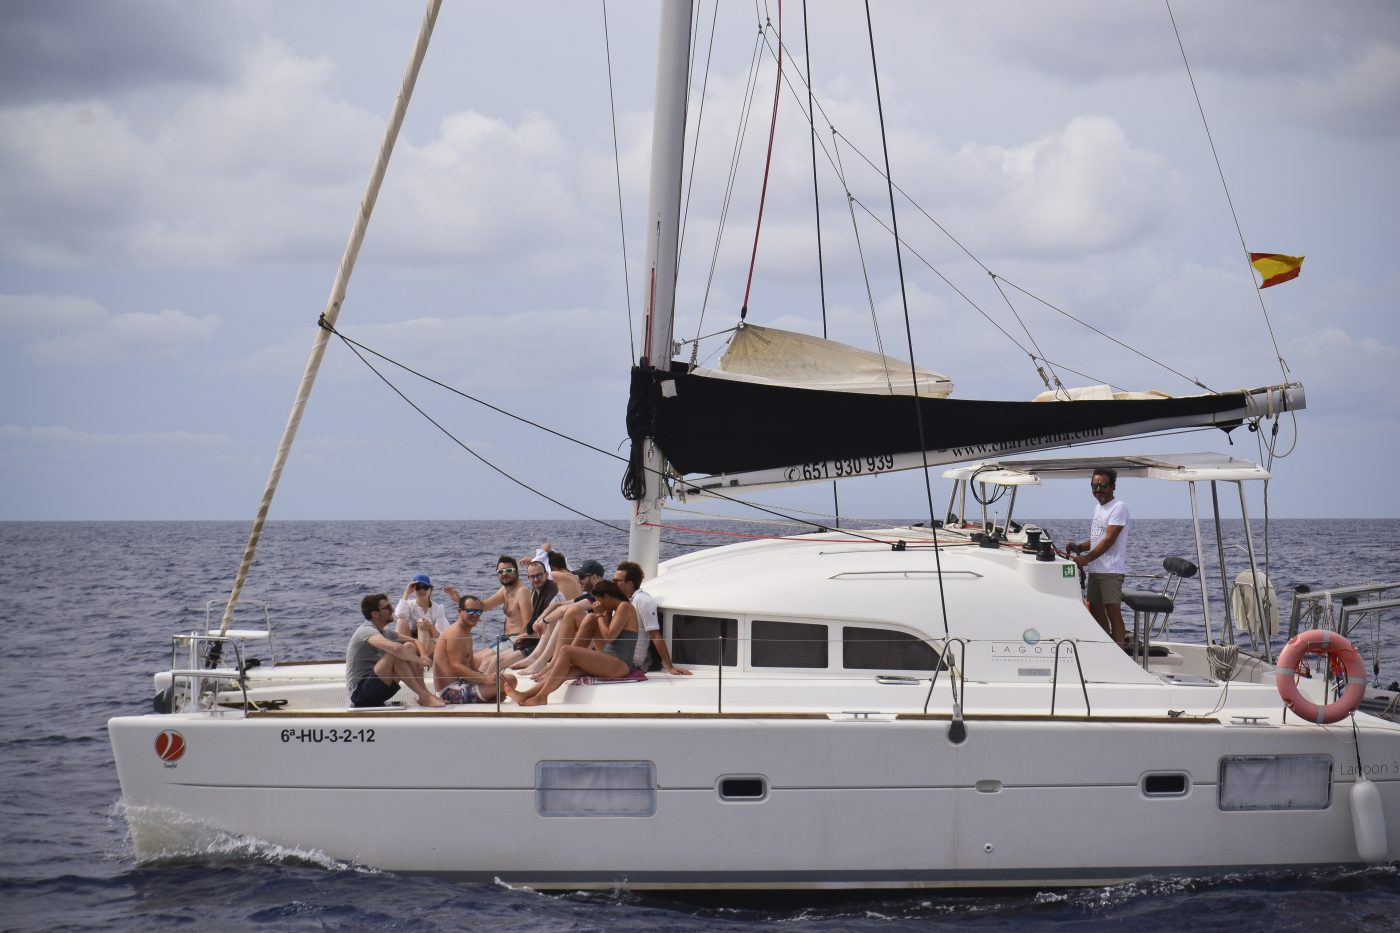 photographie_agence_évènementielle_seminaire_incentive_ibiza_mer_team_building_plage_catamaran_bateau_formentera